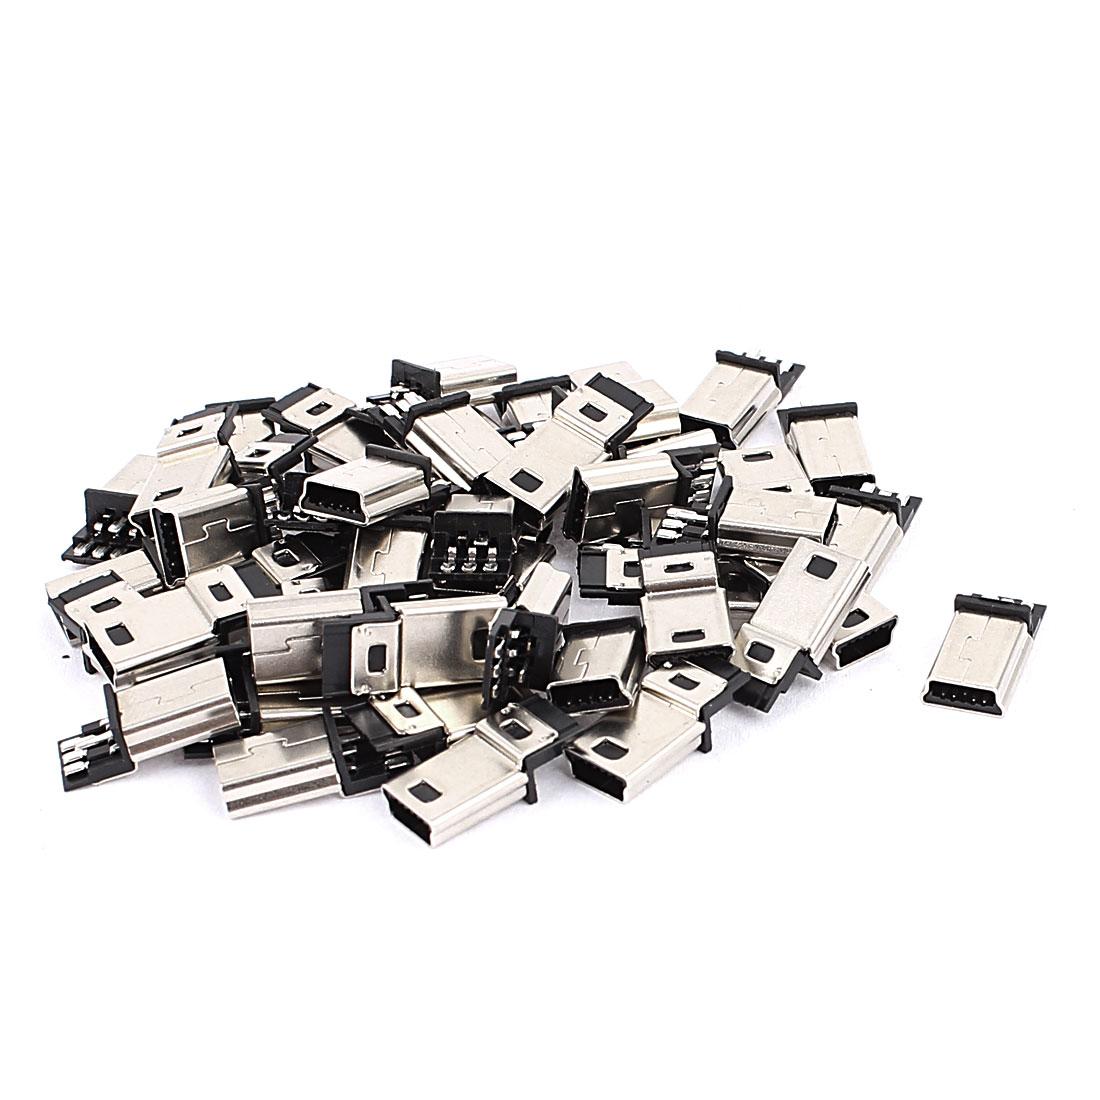 50 Pcs Micro USB B Type 5 Pin Male PCB Mount Port Jack SMD SMT Socket